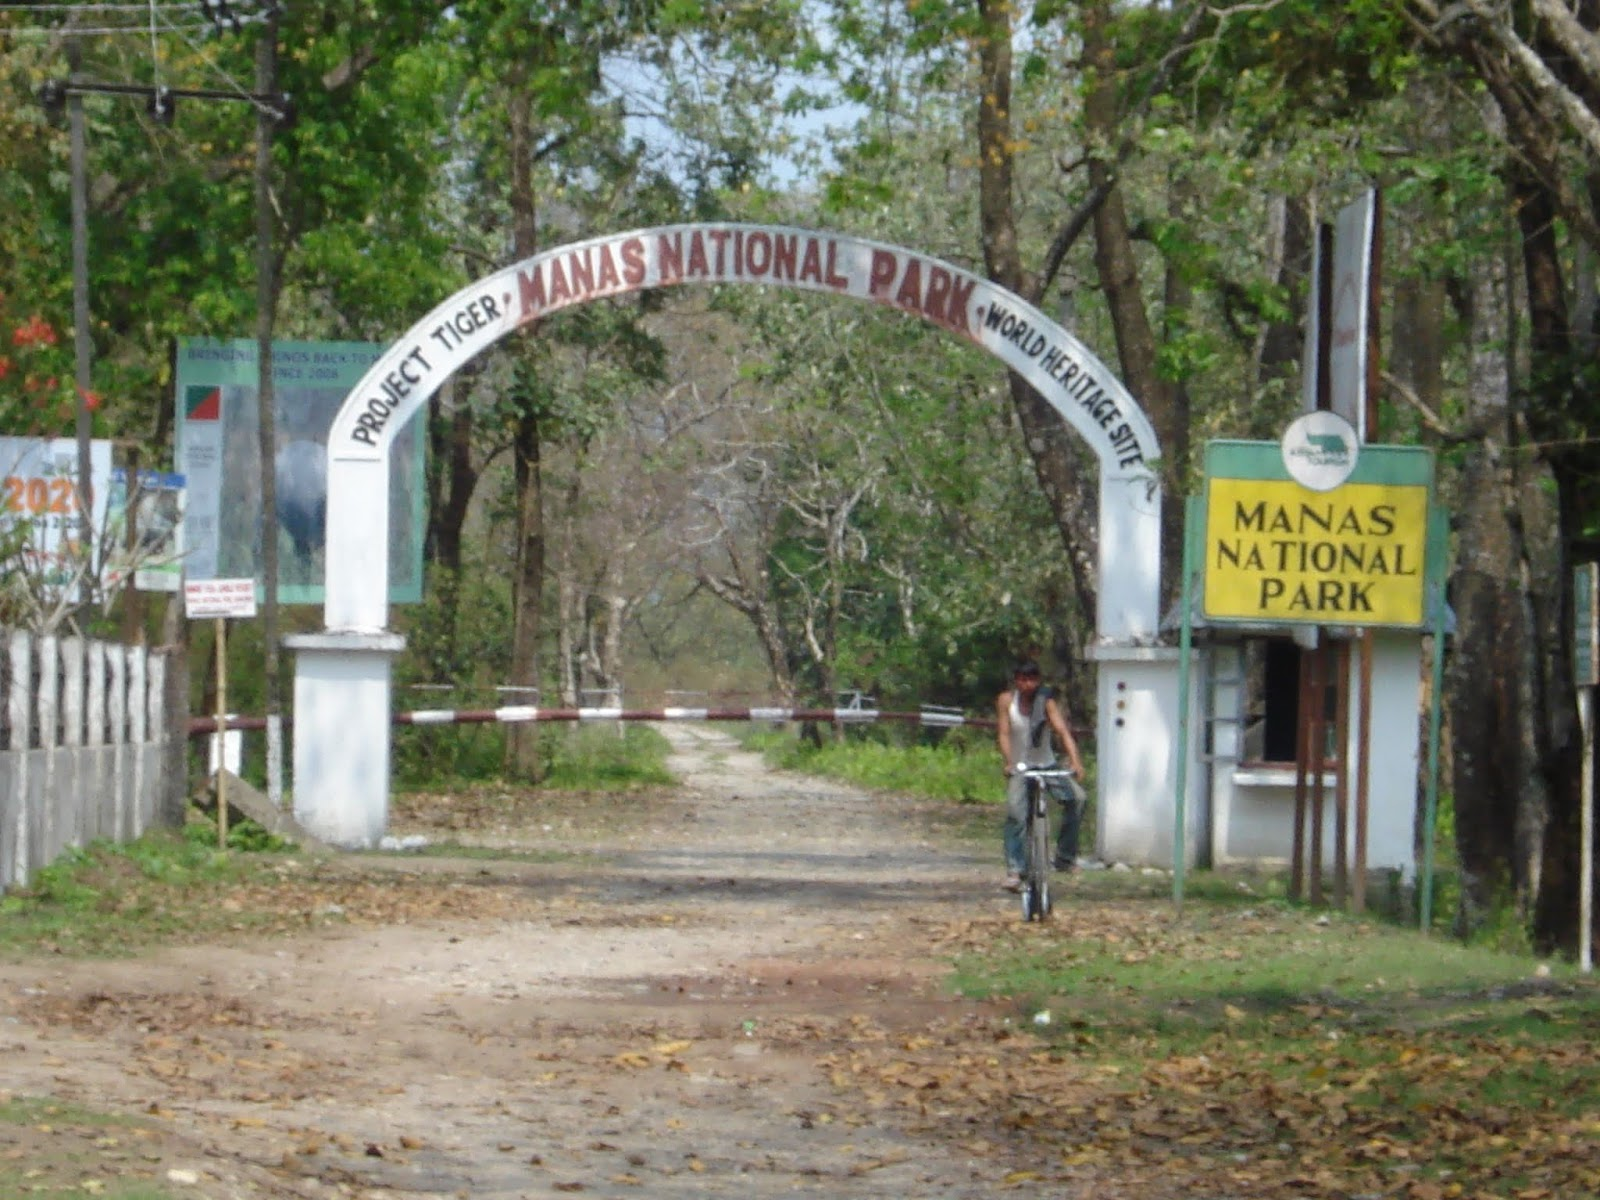 Manas National Park, Heritage SIte of Assam - Go Travel Treasures